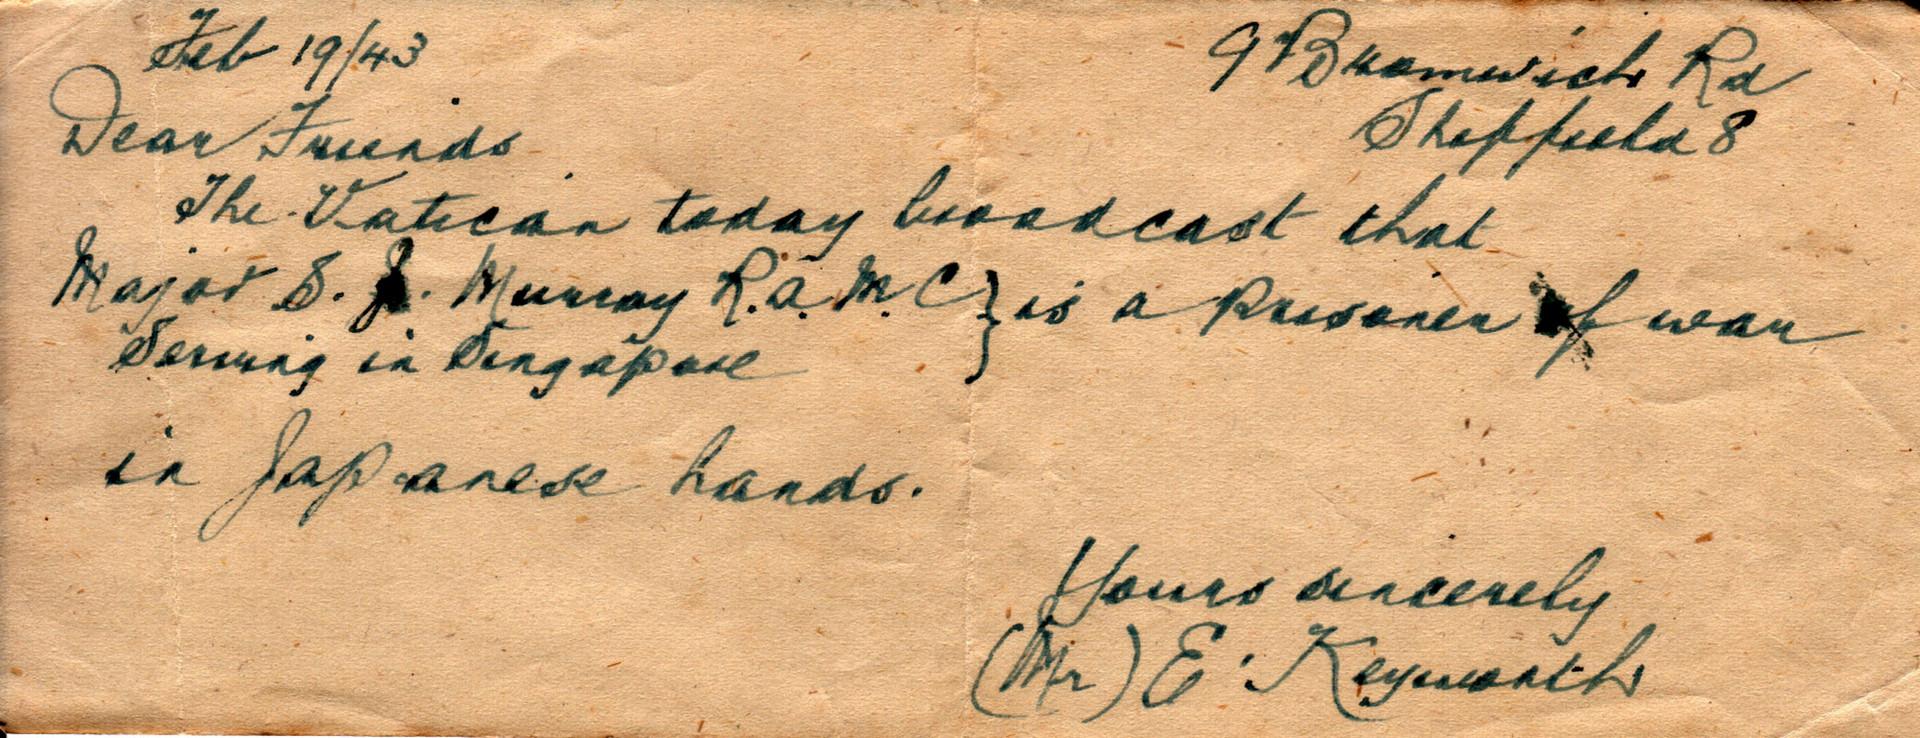 1943.02.19 Vatican Keyworth